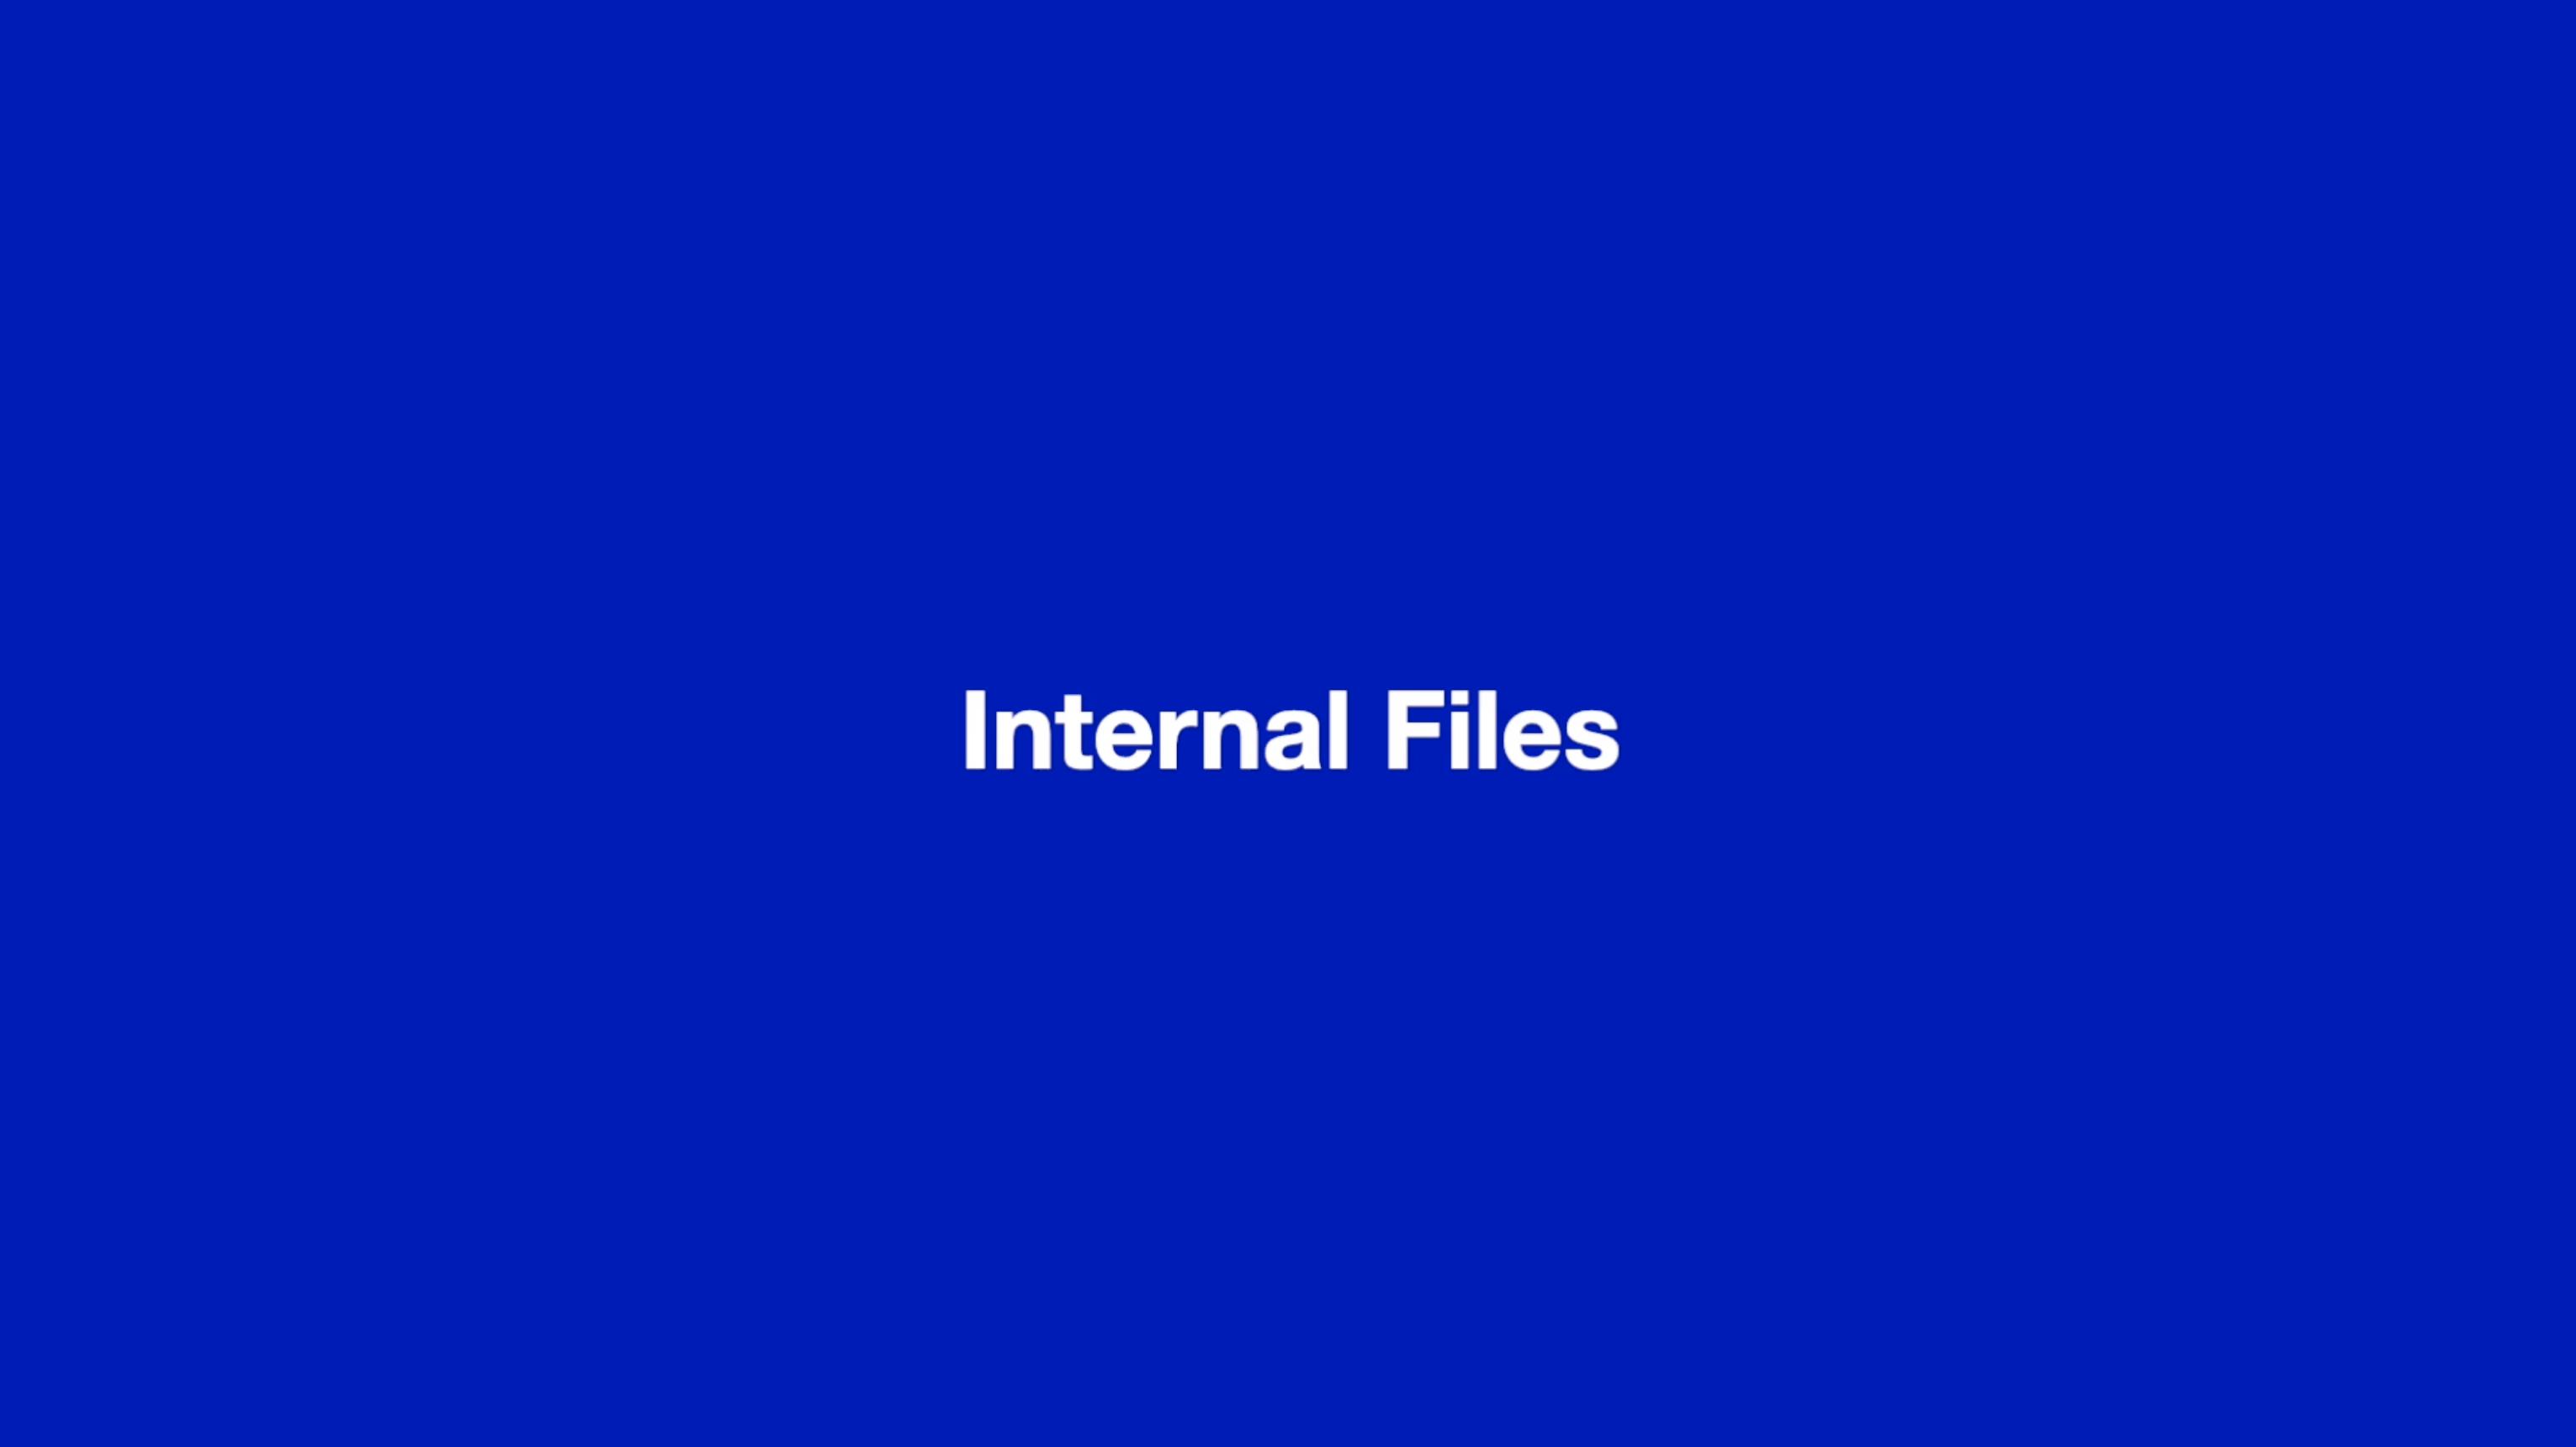 Internal files thumbnail